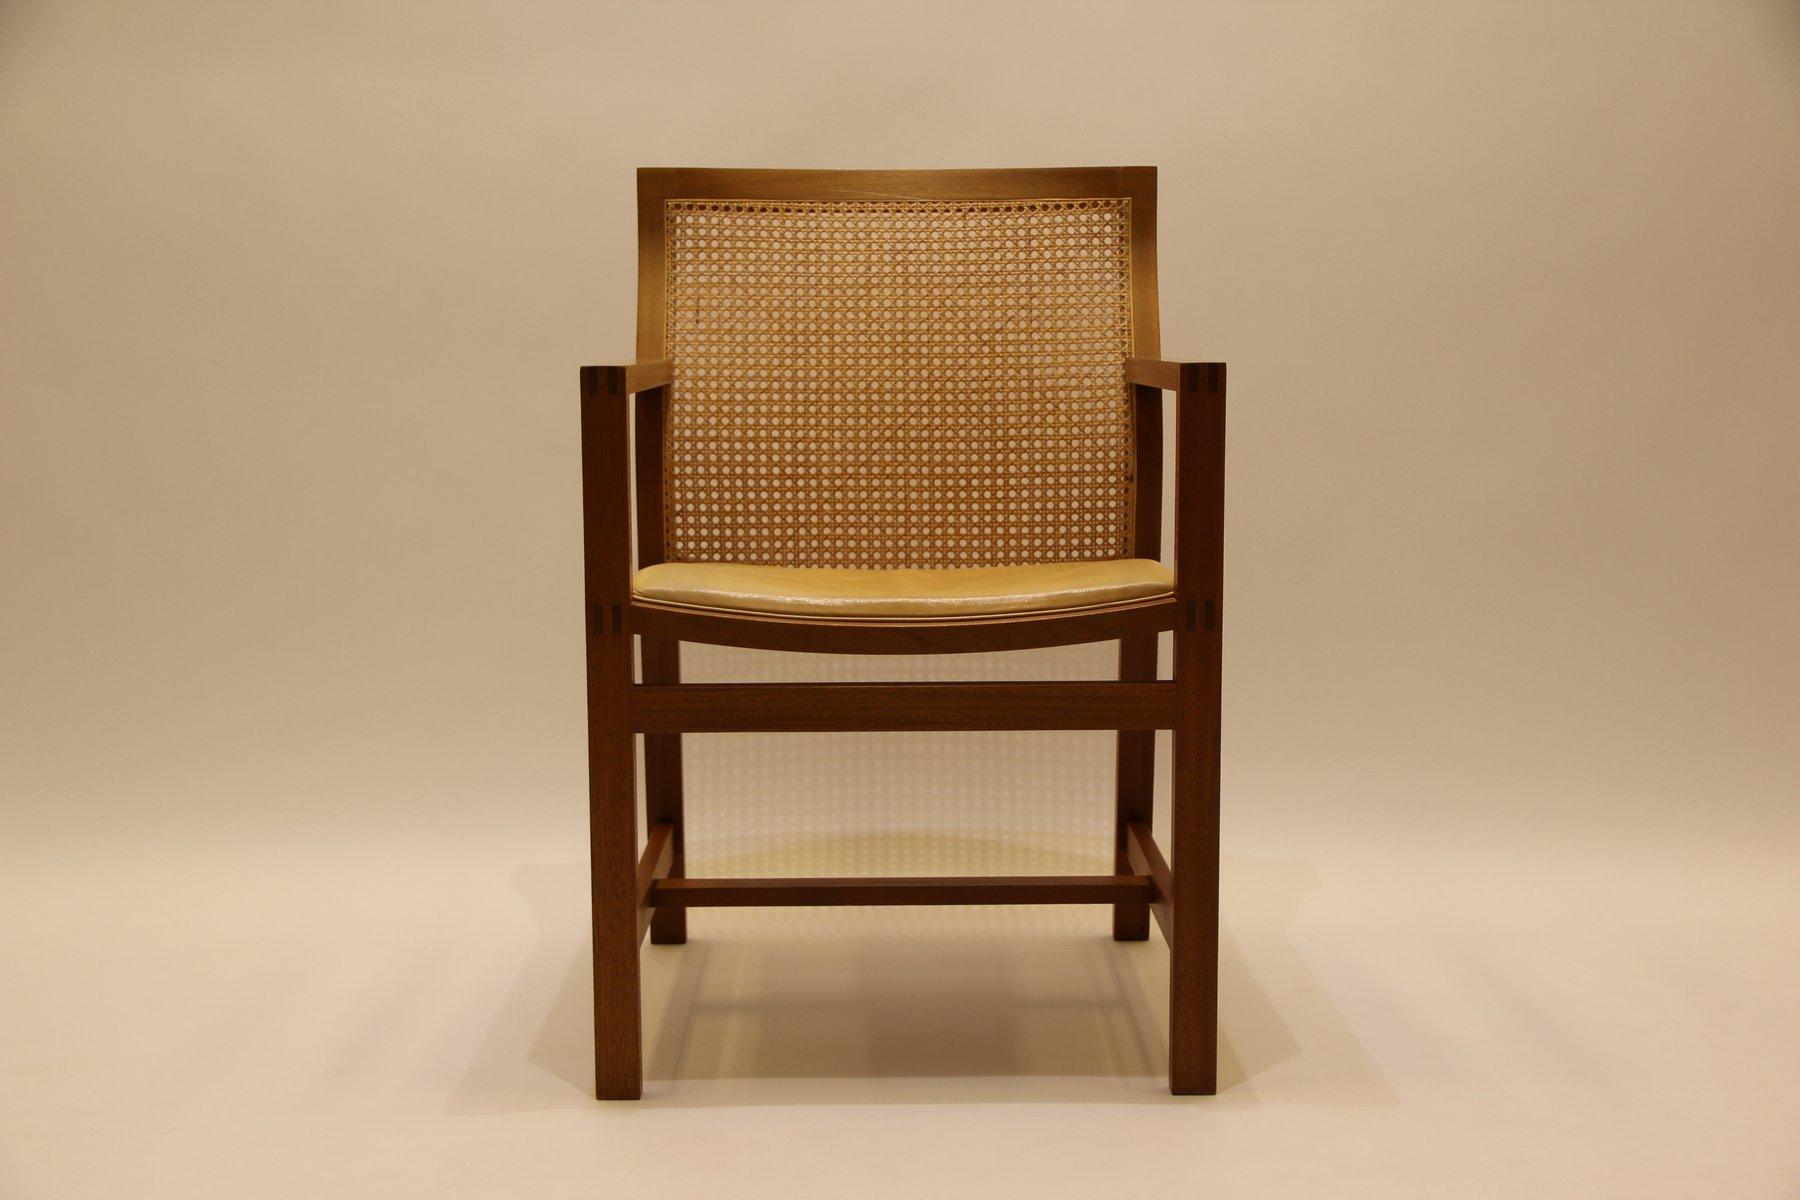 Mid century king series stuhl aus mahagoni leder von thygesen s rensen f r fredericia bei - Mid century stuhl ...